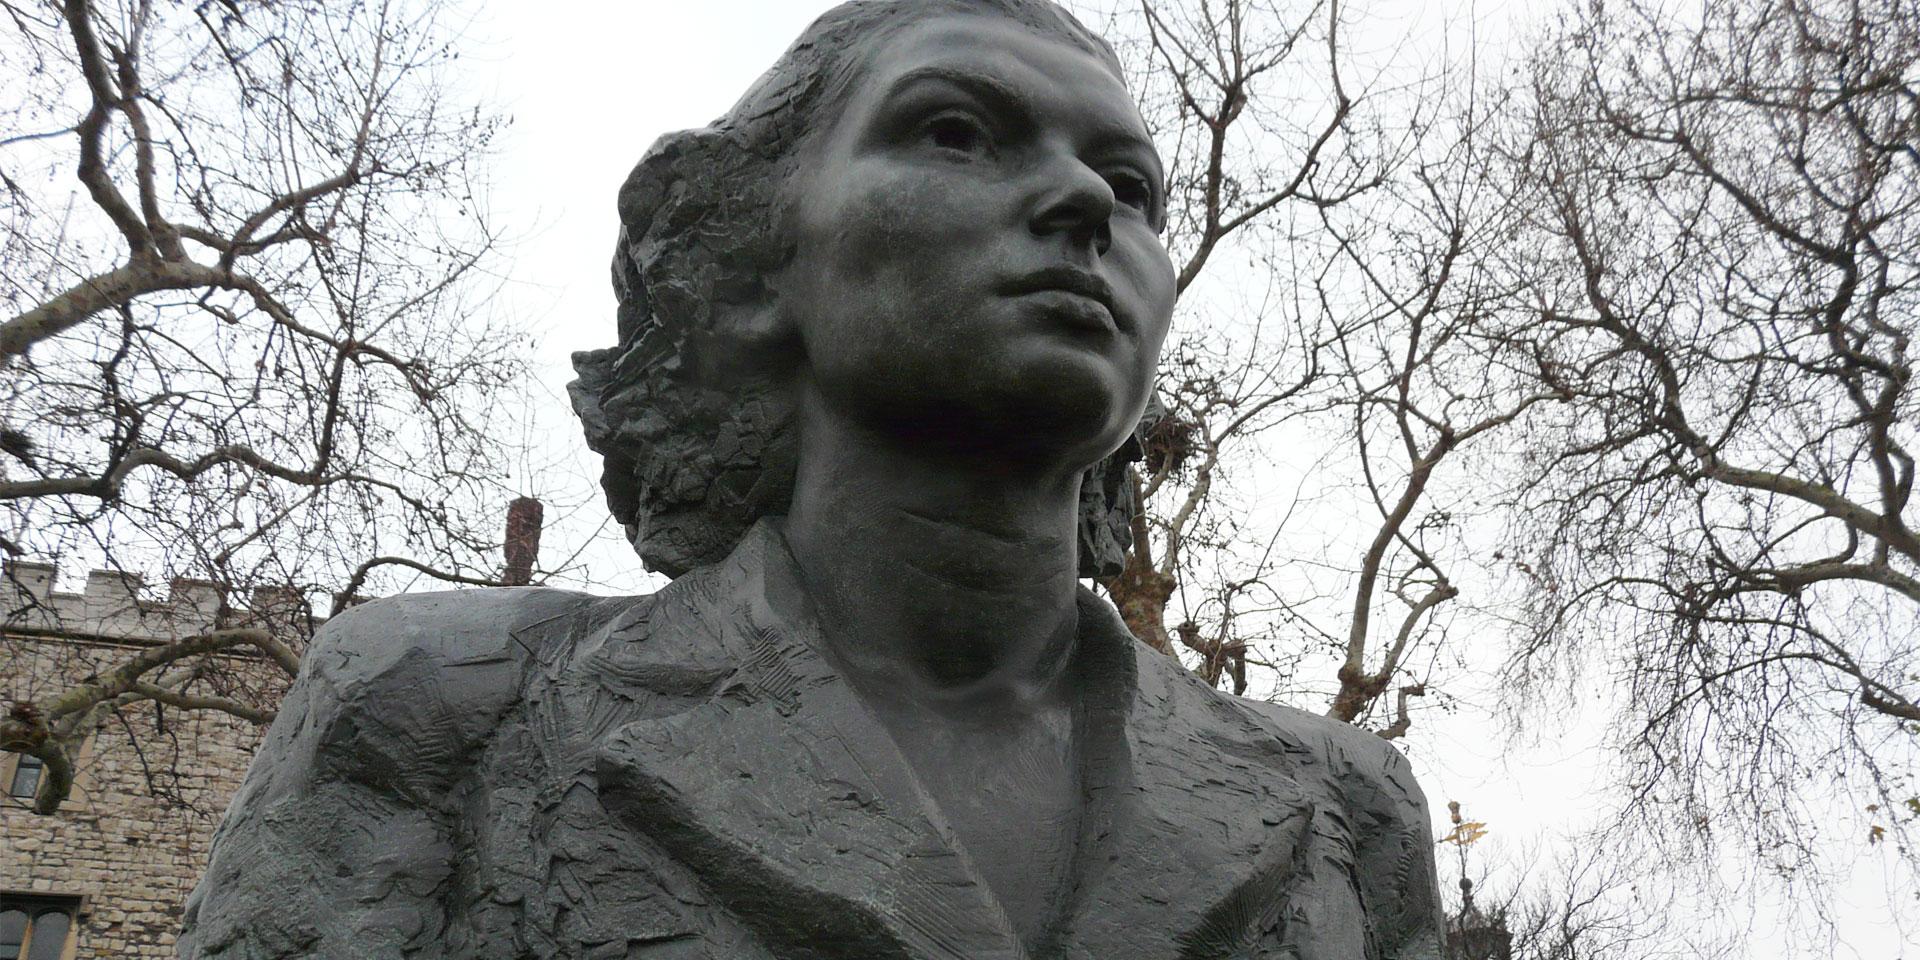 Violette Szabo, SOE Memorial, London, 2009